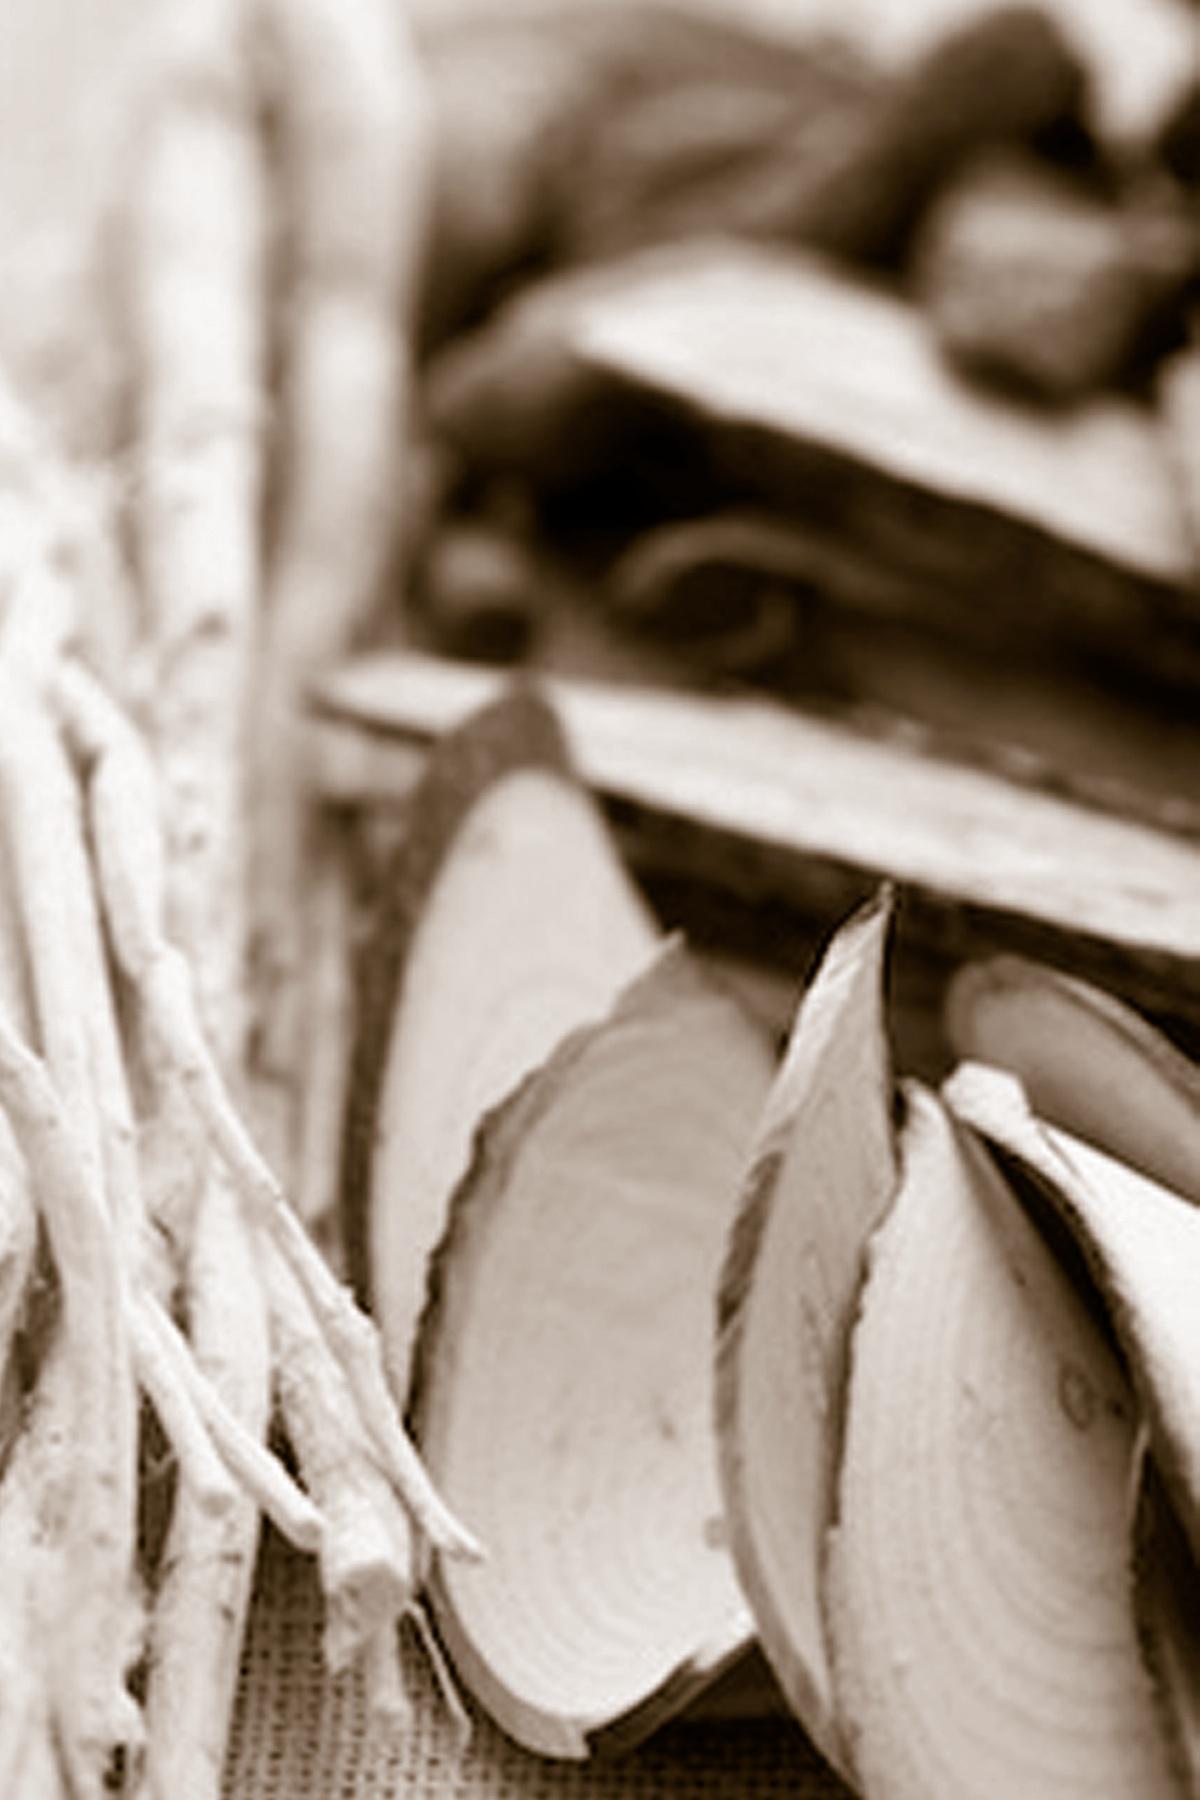 raw herbs sample 4x6.jpg